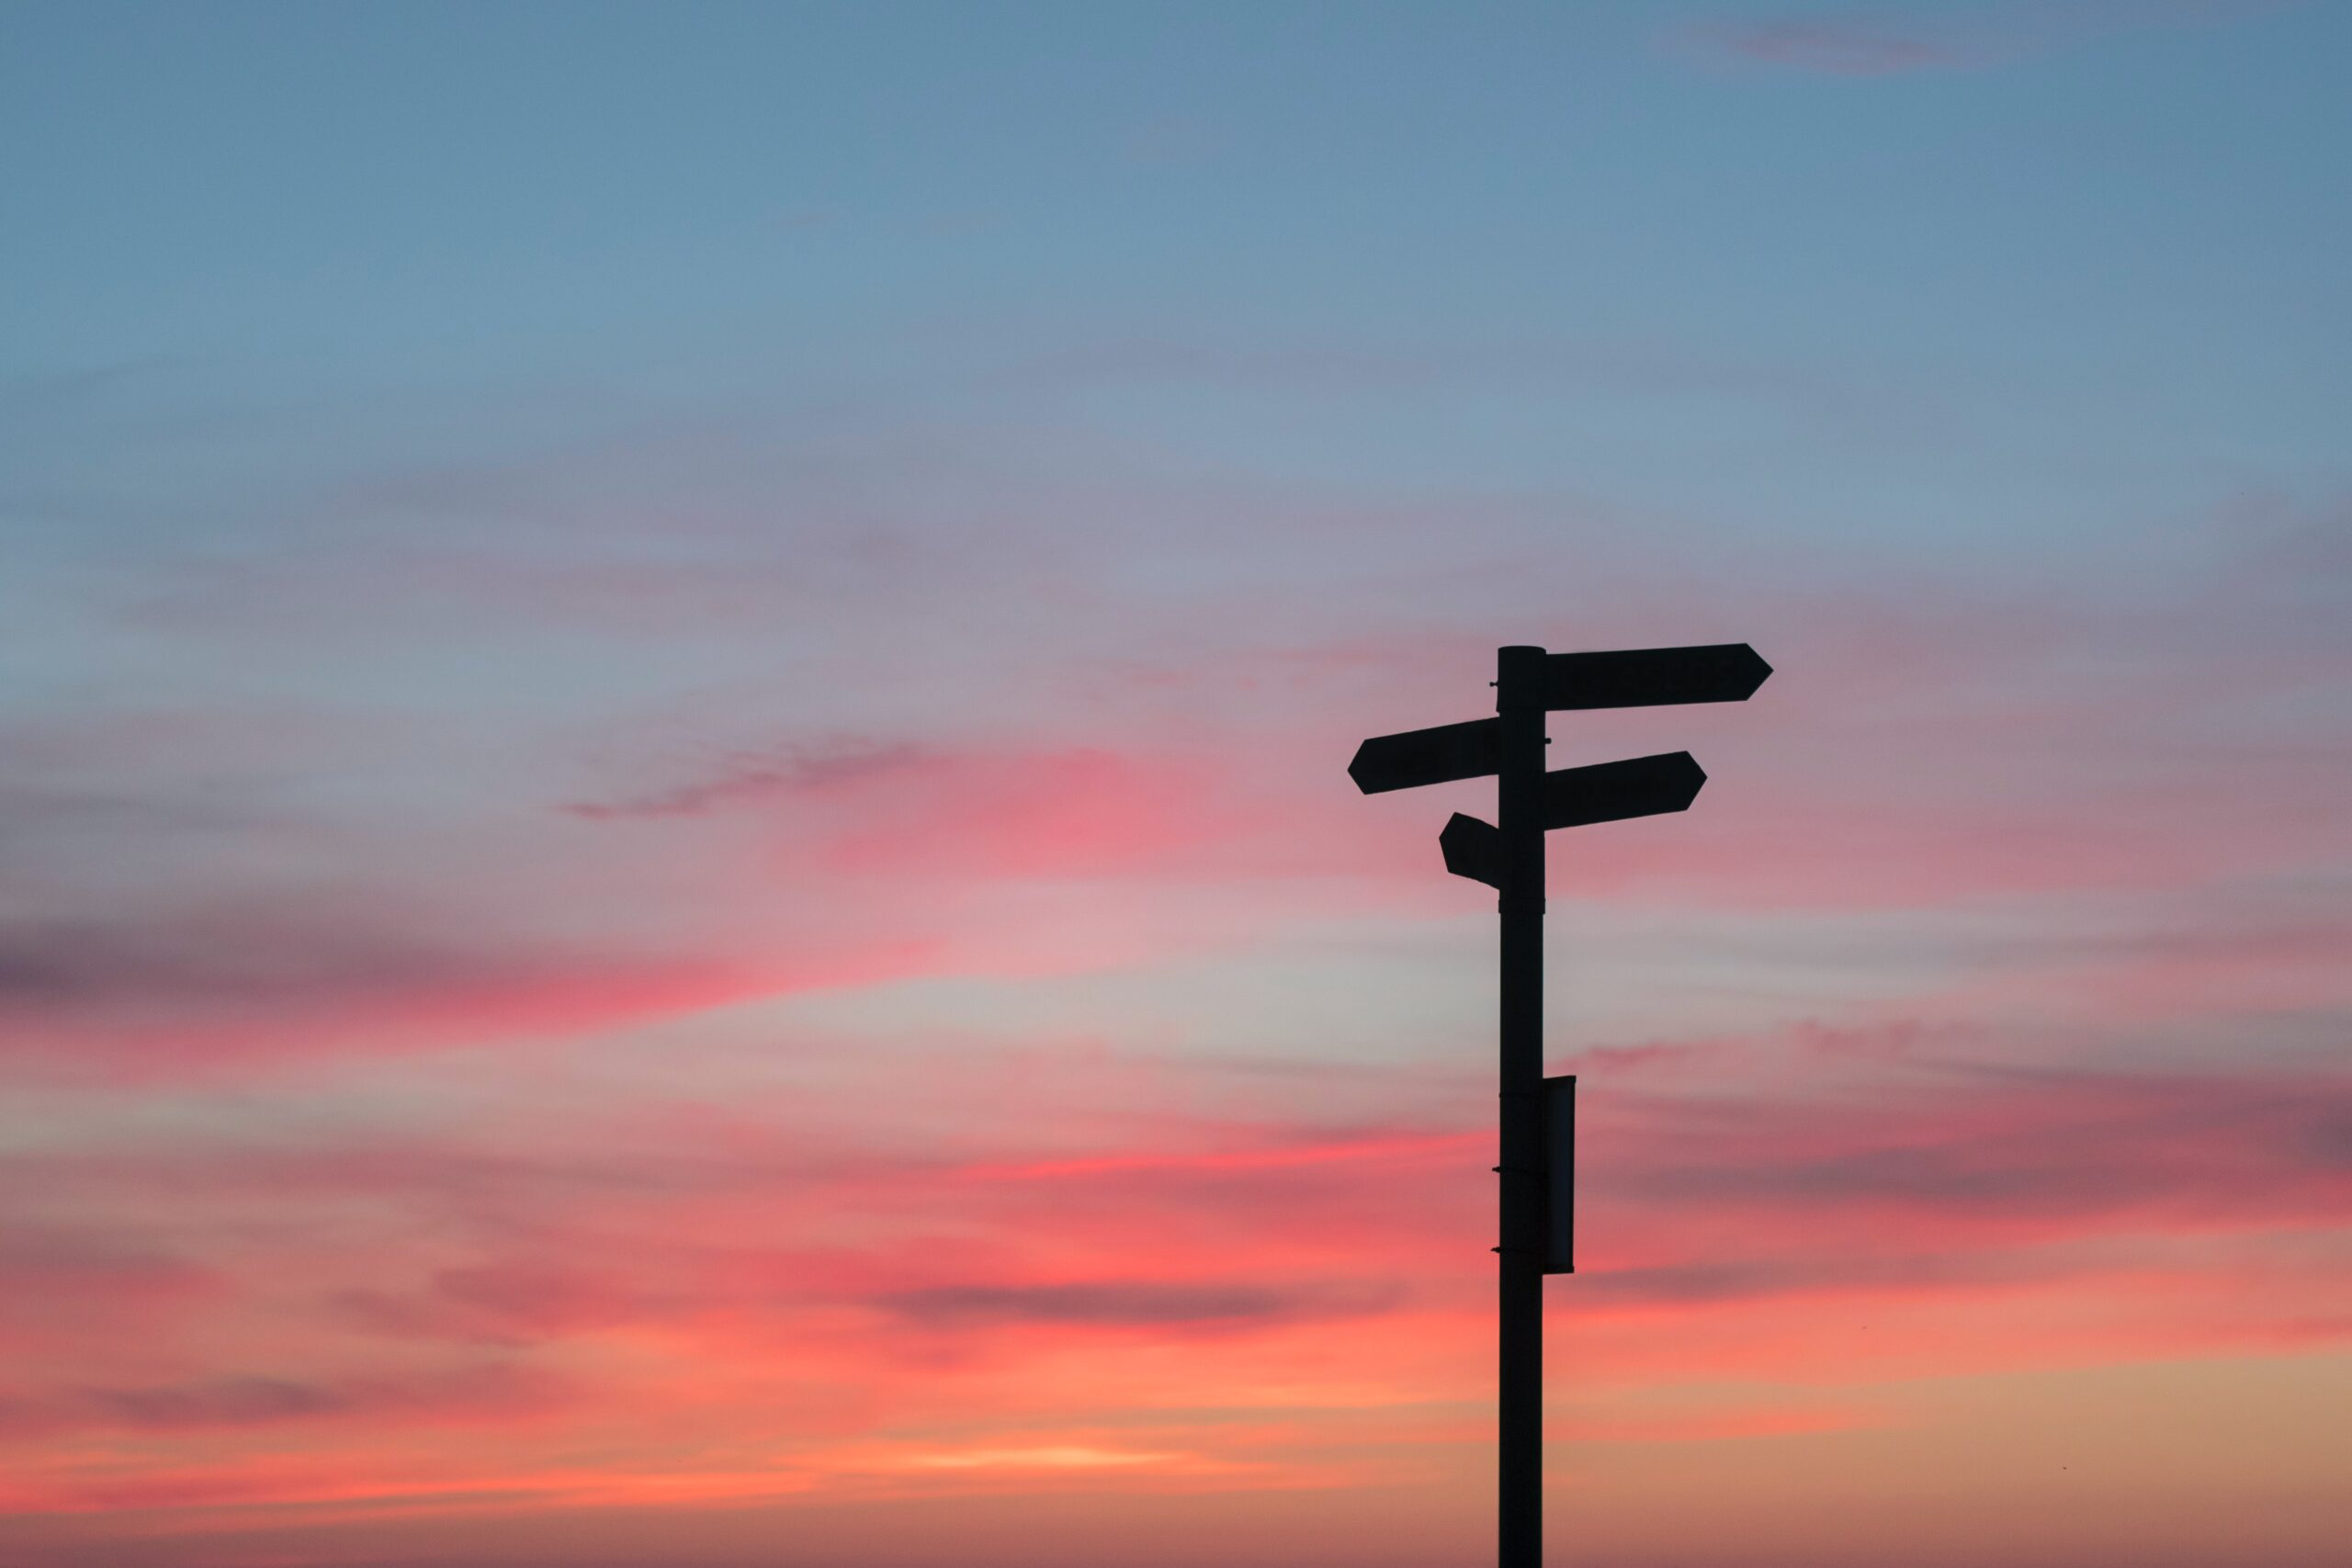 Crossroads sign at dusk